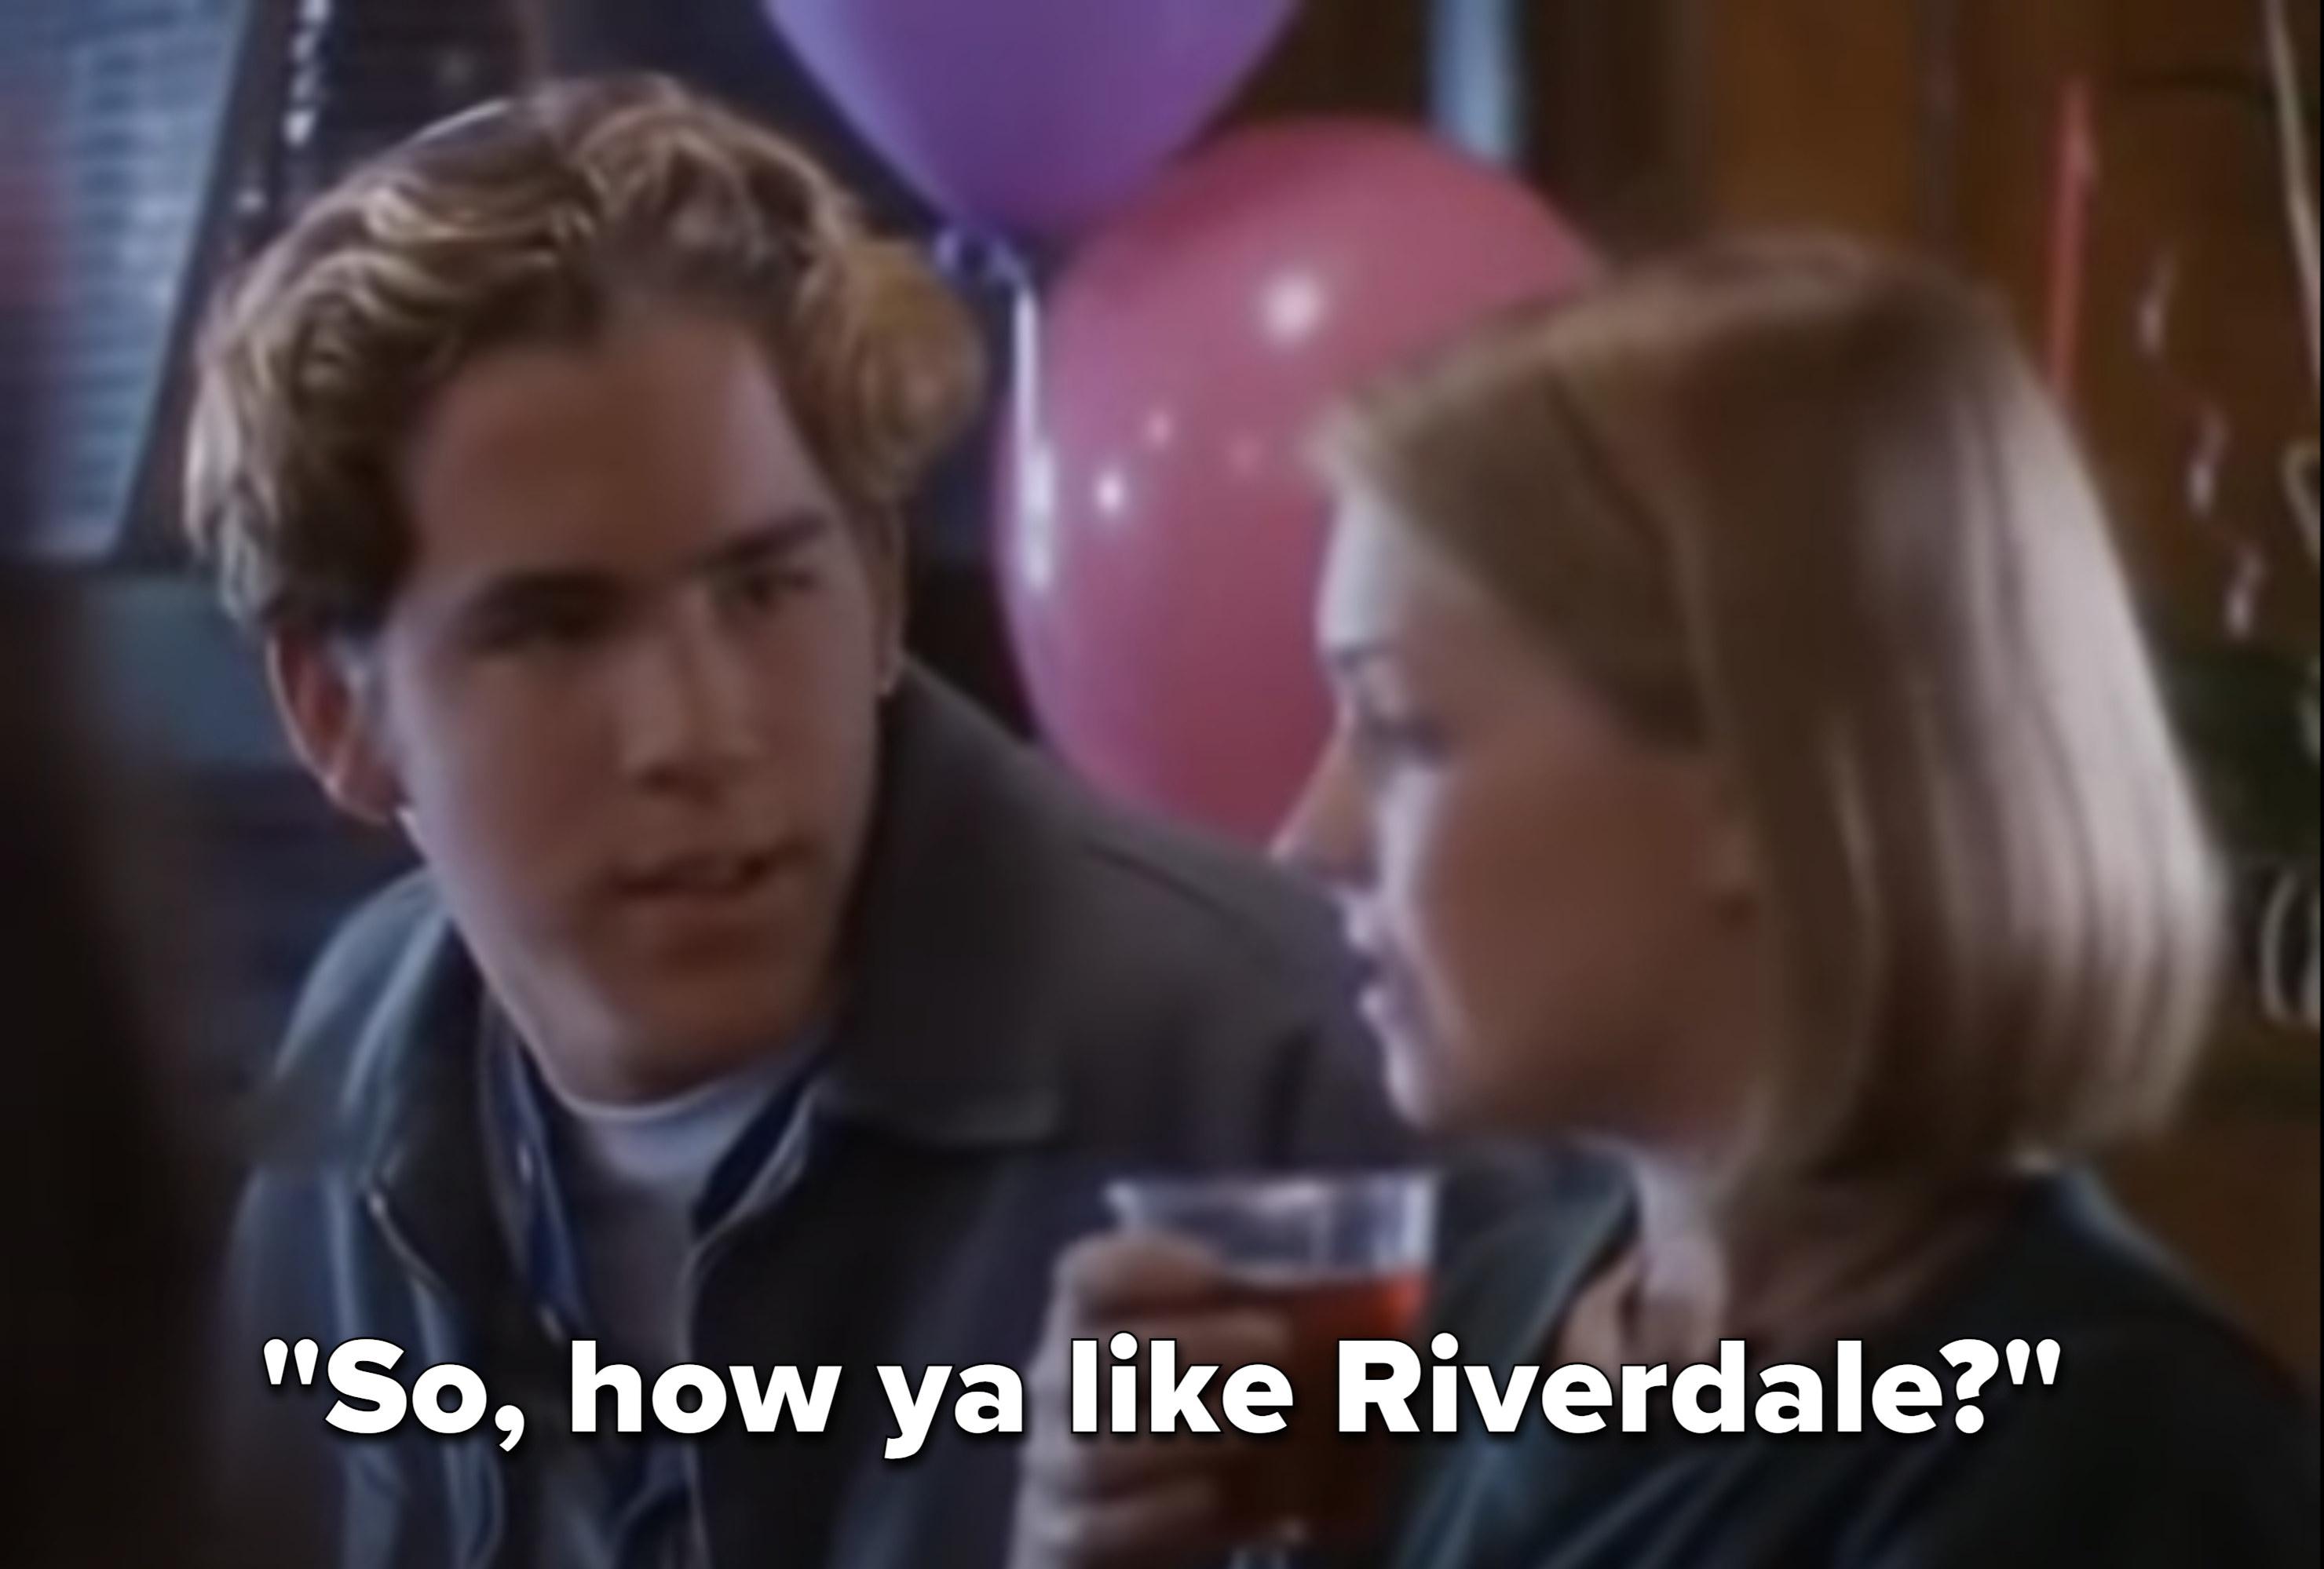 Ryan (as Seth) asks Sabrina how she likes Riverdale